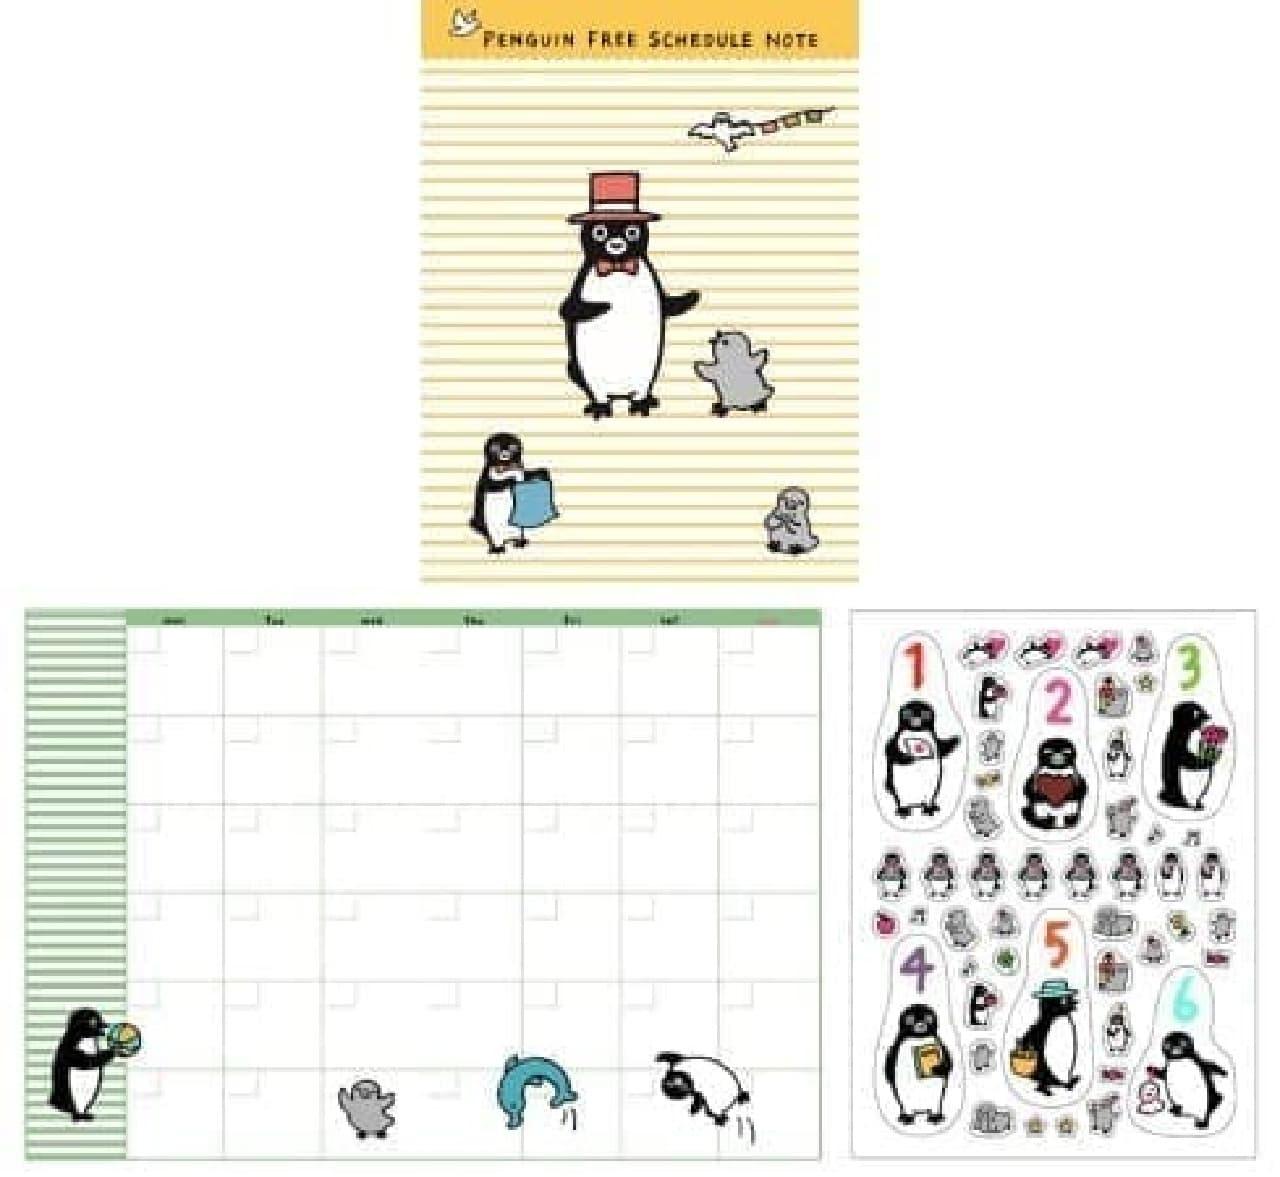 Suicaのペンギン フリースケジュールノート